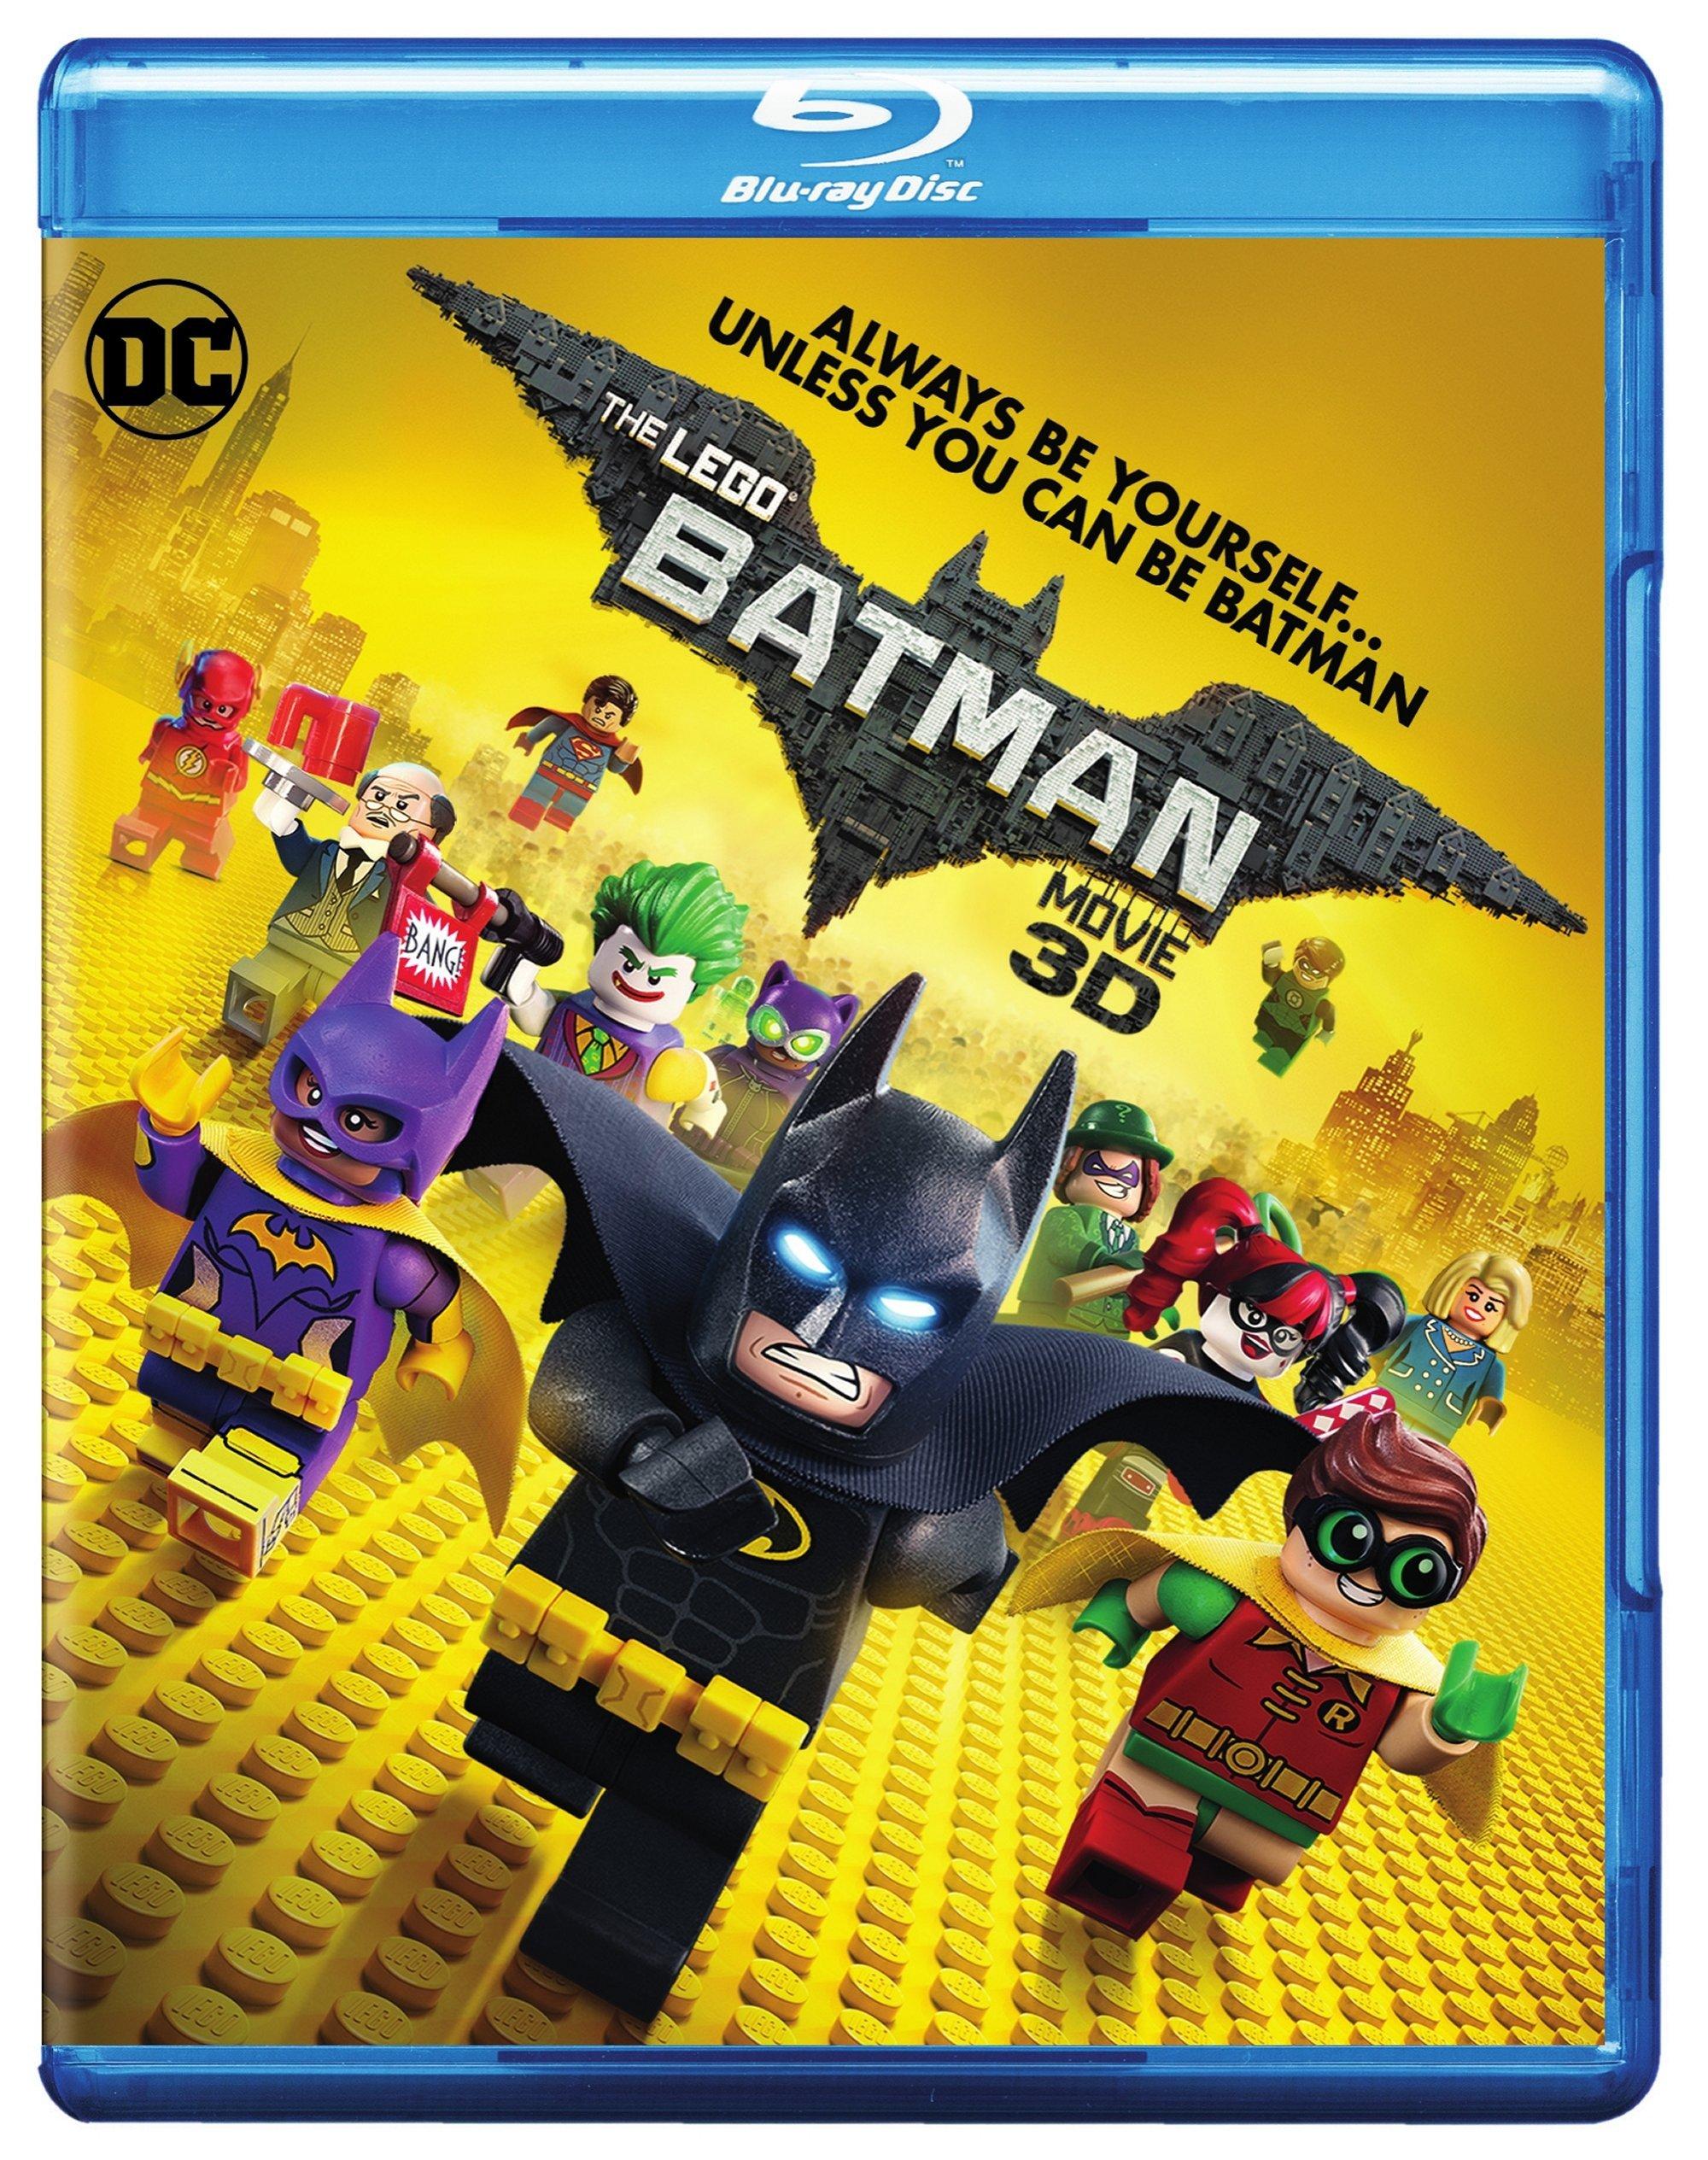 Blu-ray 3D : The Lego Batman Movie (With Blu-Ray, With DVD, Ultraviolet Digital Copy, Digital Copy, Digitally Mastered in HD)